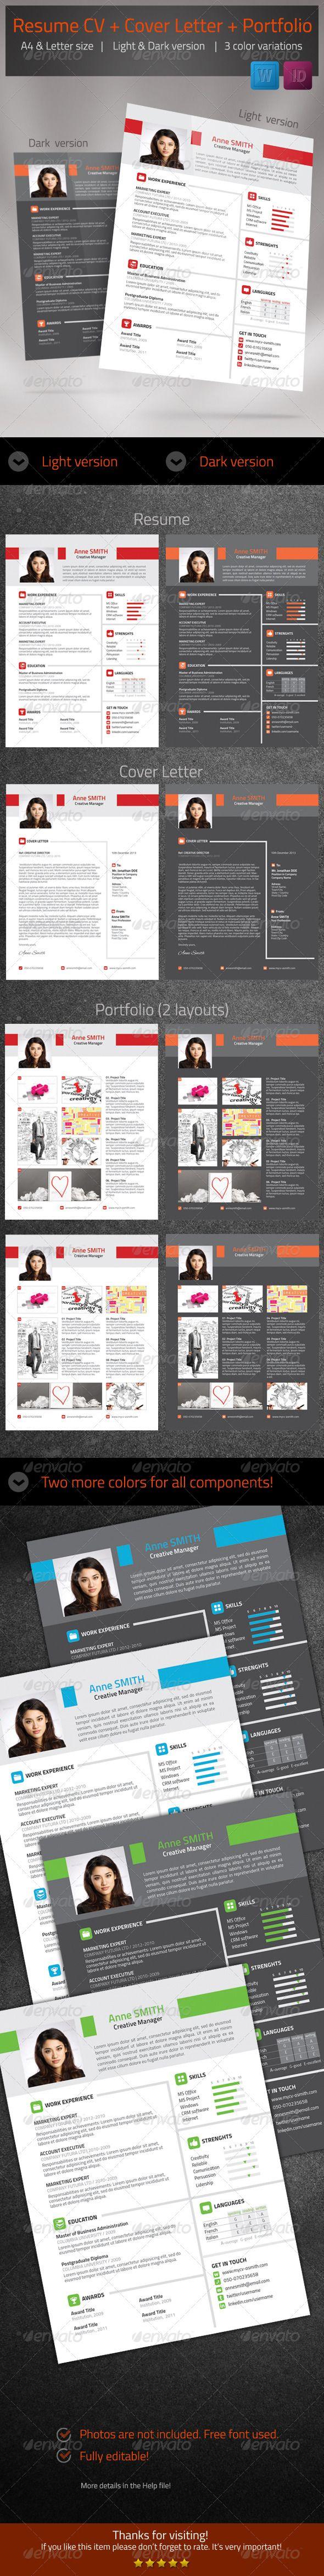 Beautiful Resume set cv cover letter portfolio